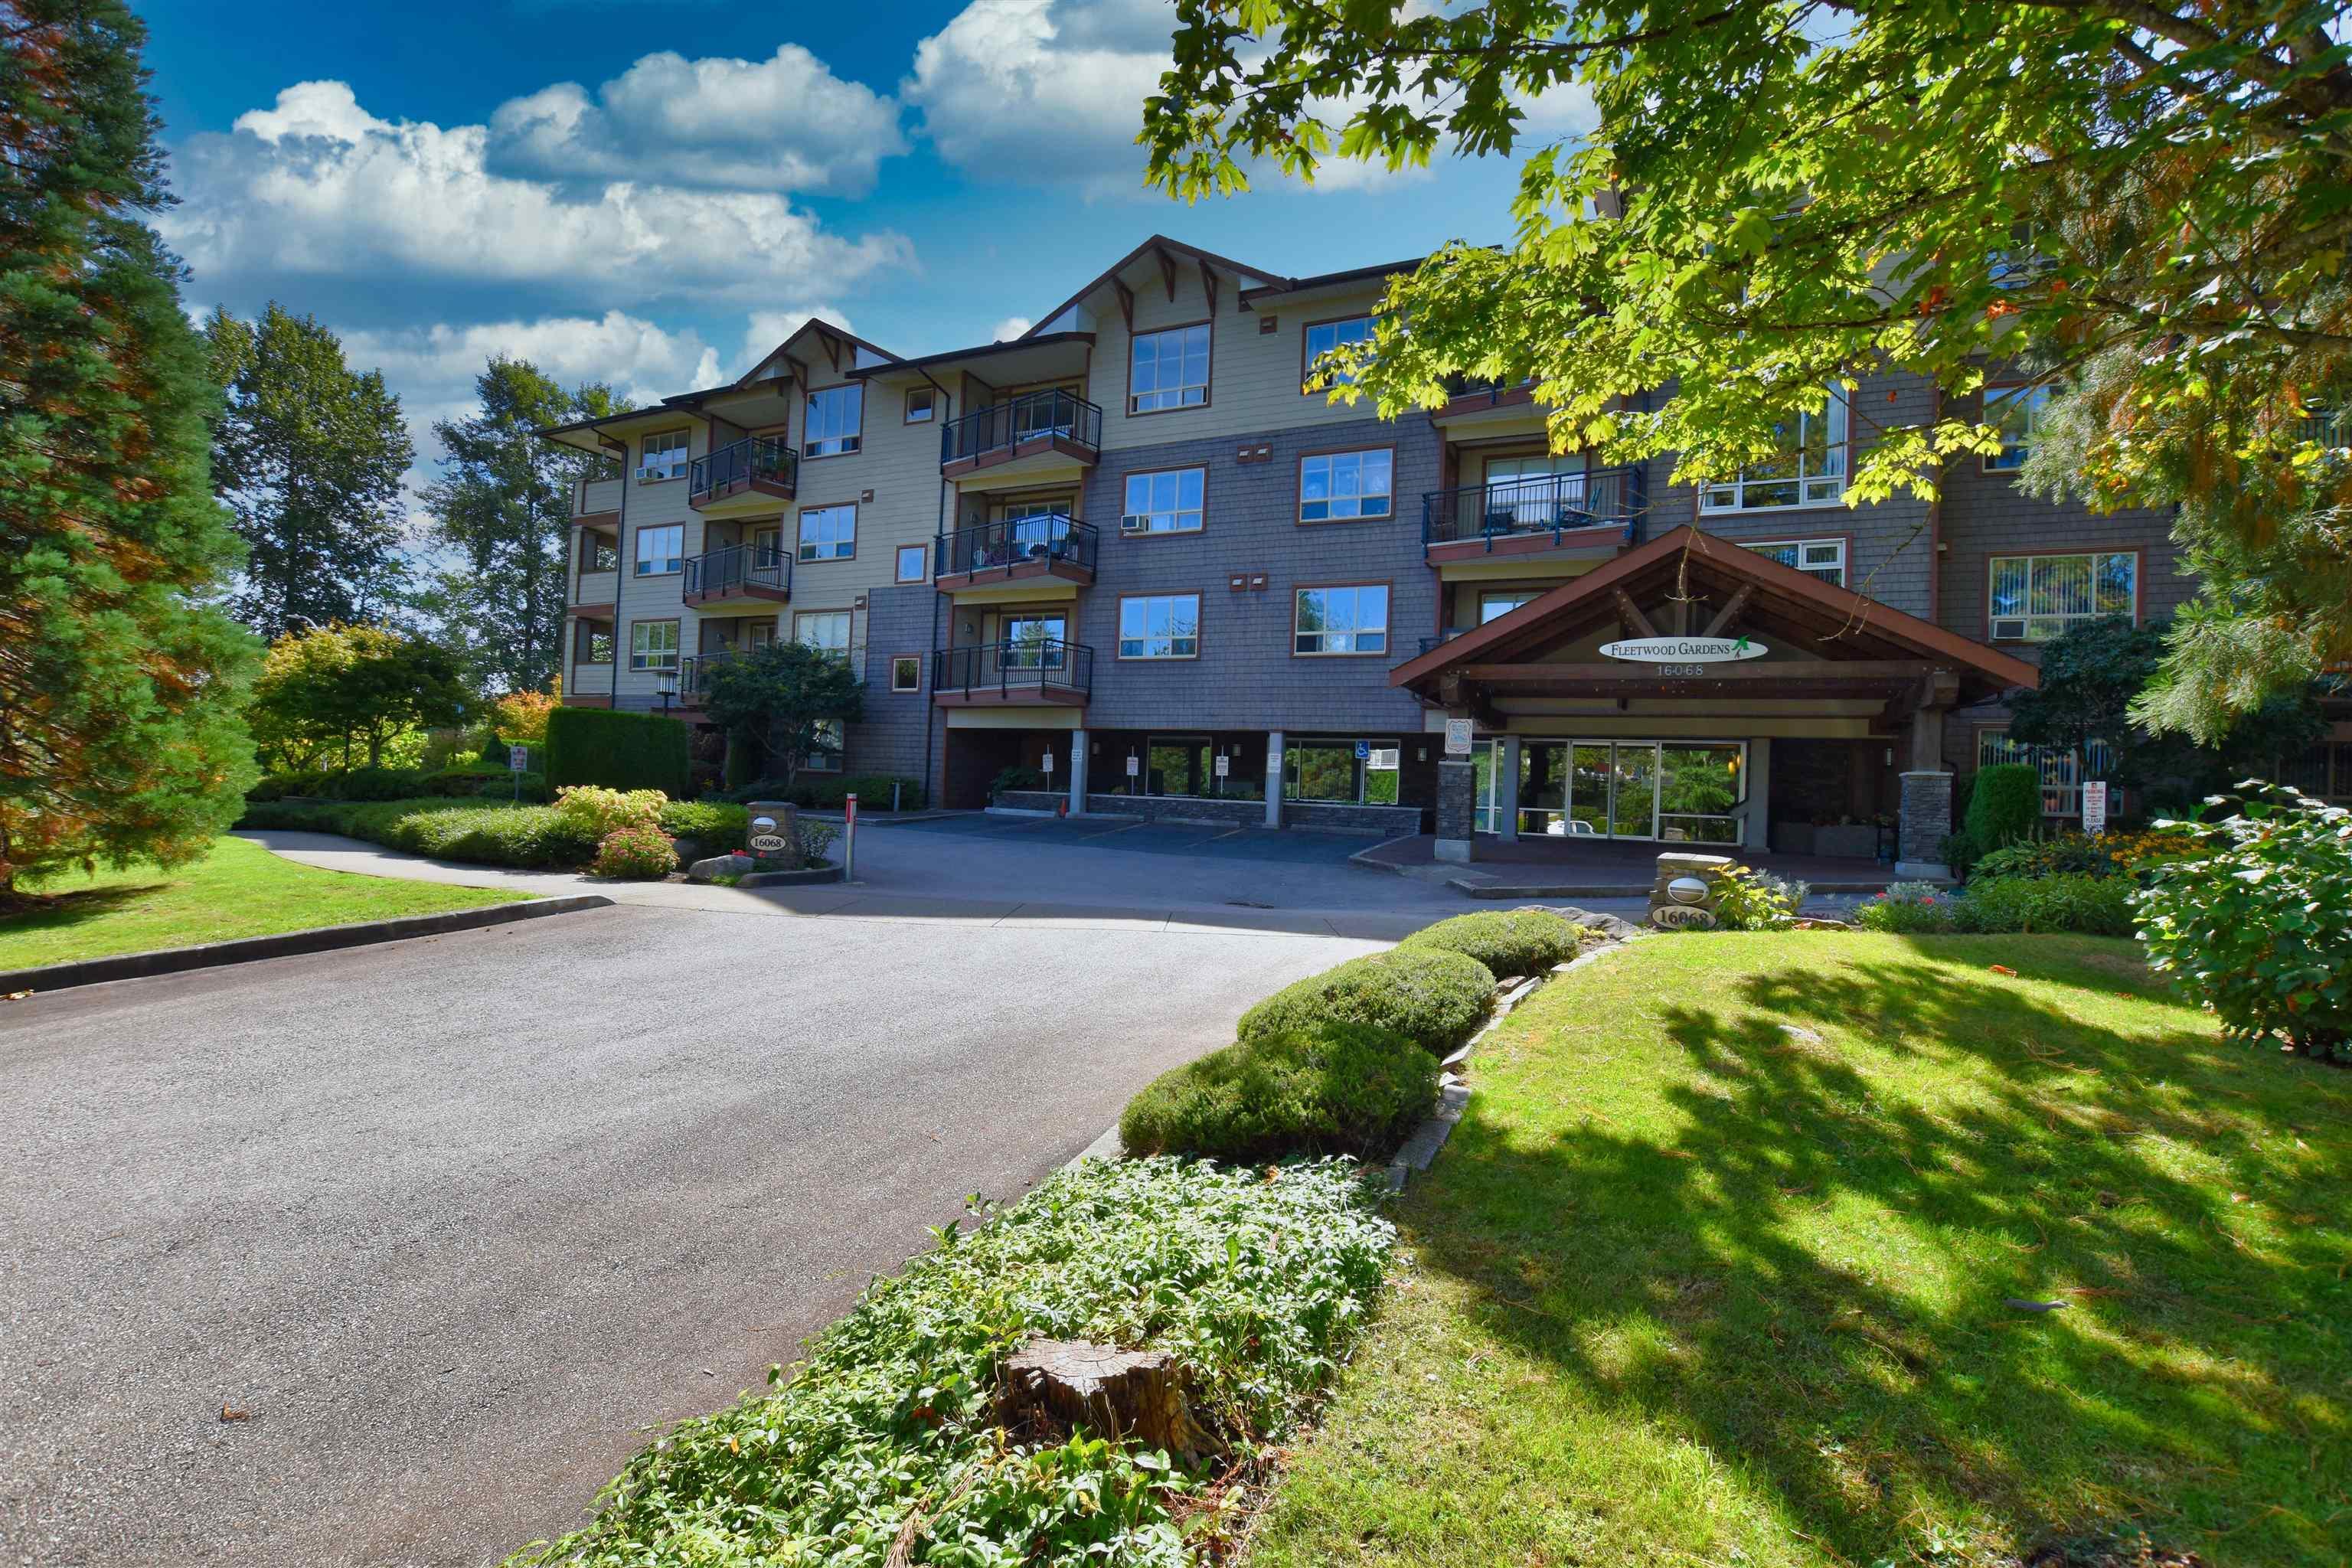 304 16068 83 AVENUE - Fleetwood Tynehead Apartment/Condo for sale, 2 Bedrooms (R2615331)